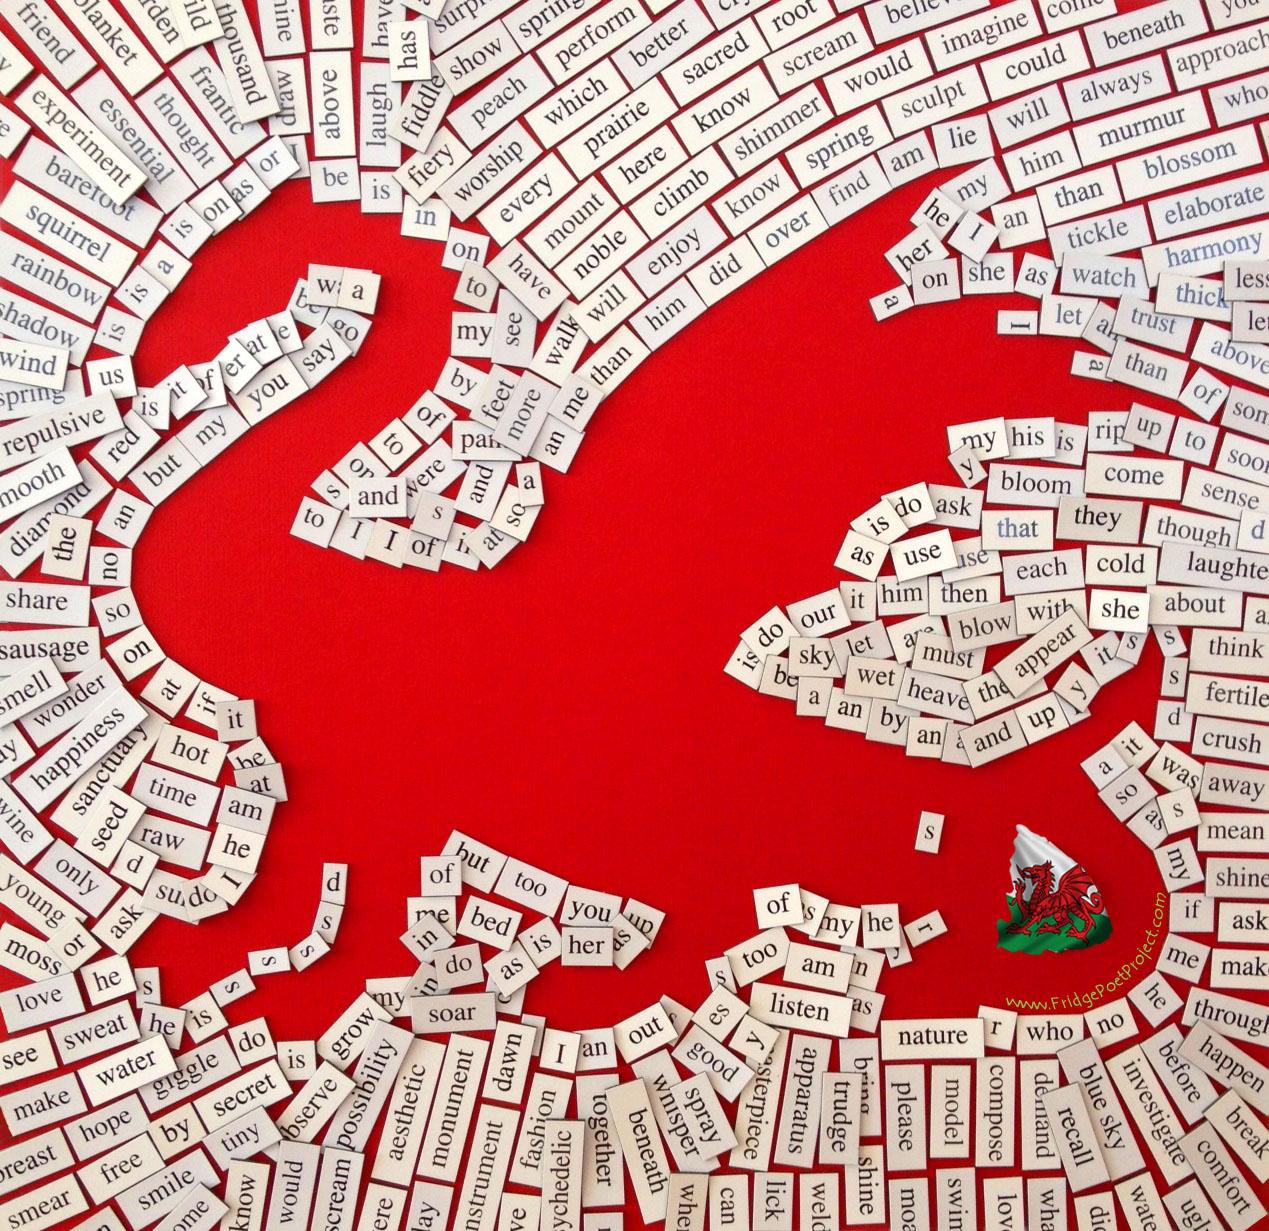 FridgePoet Project Magnet Dragon